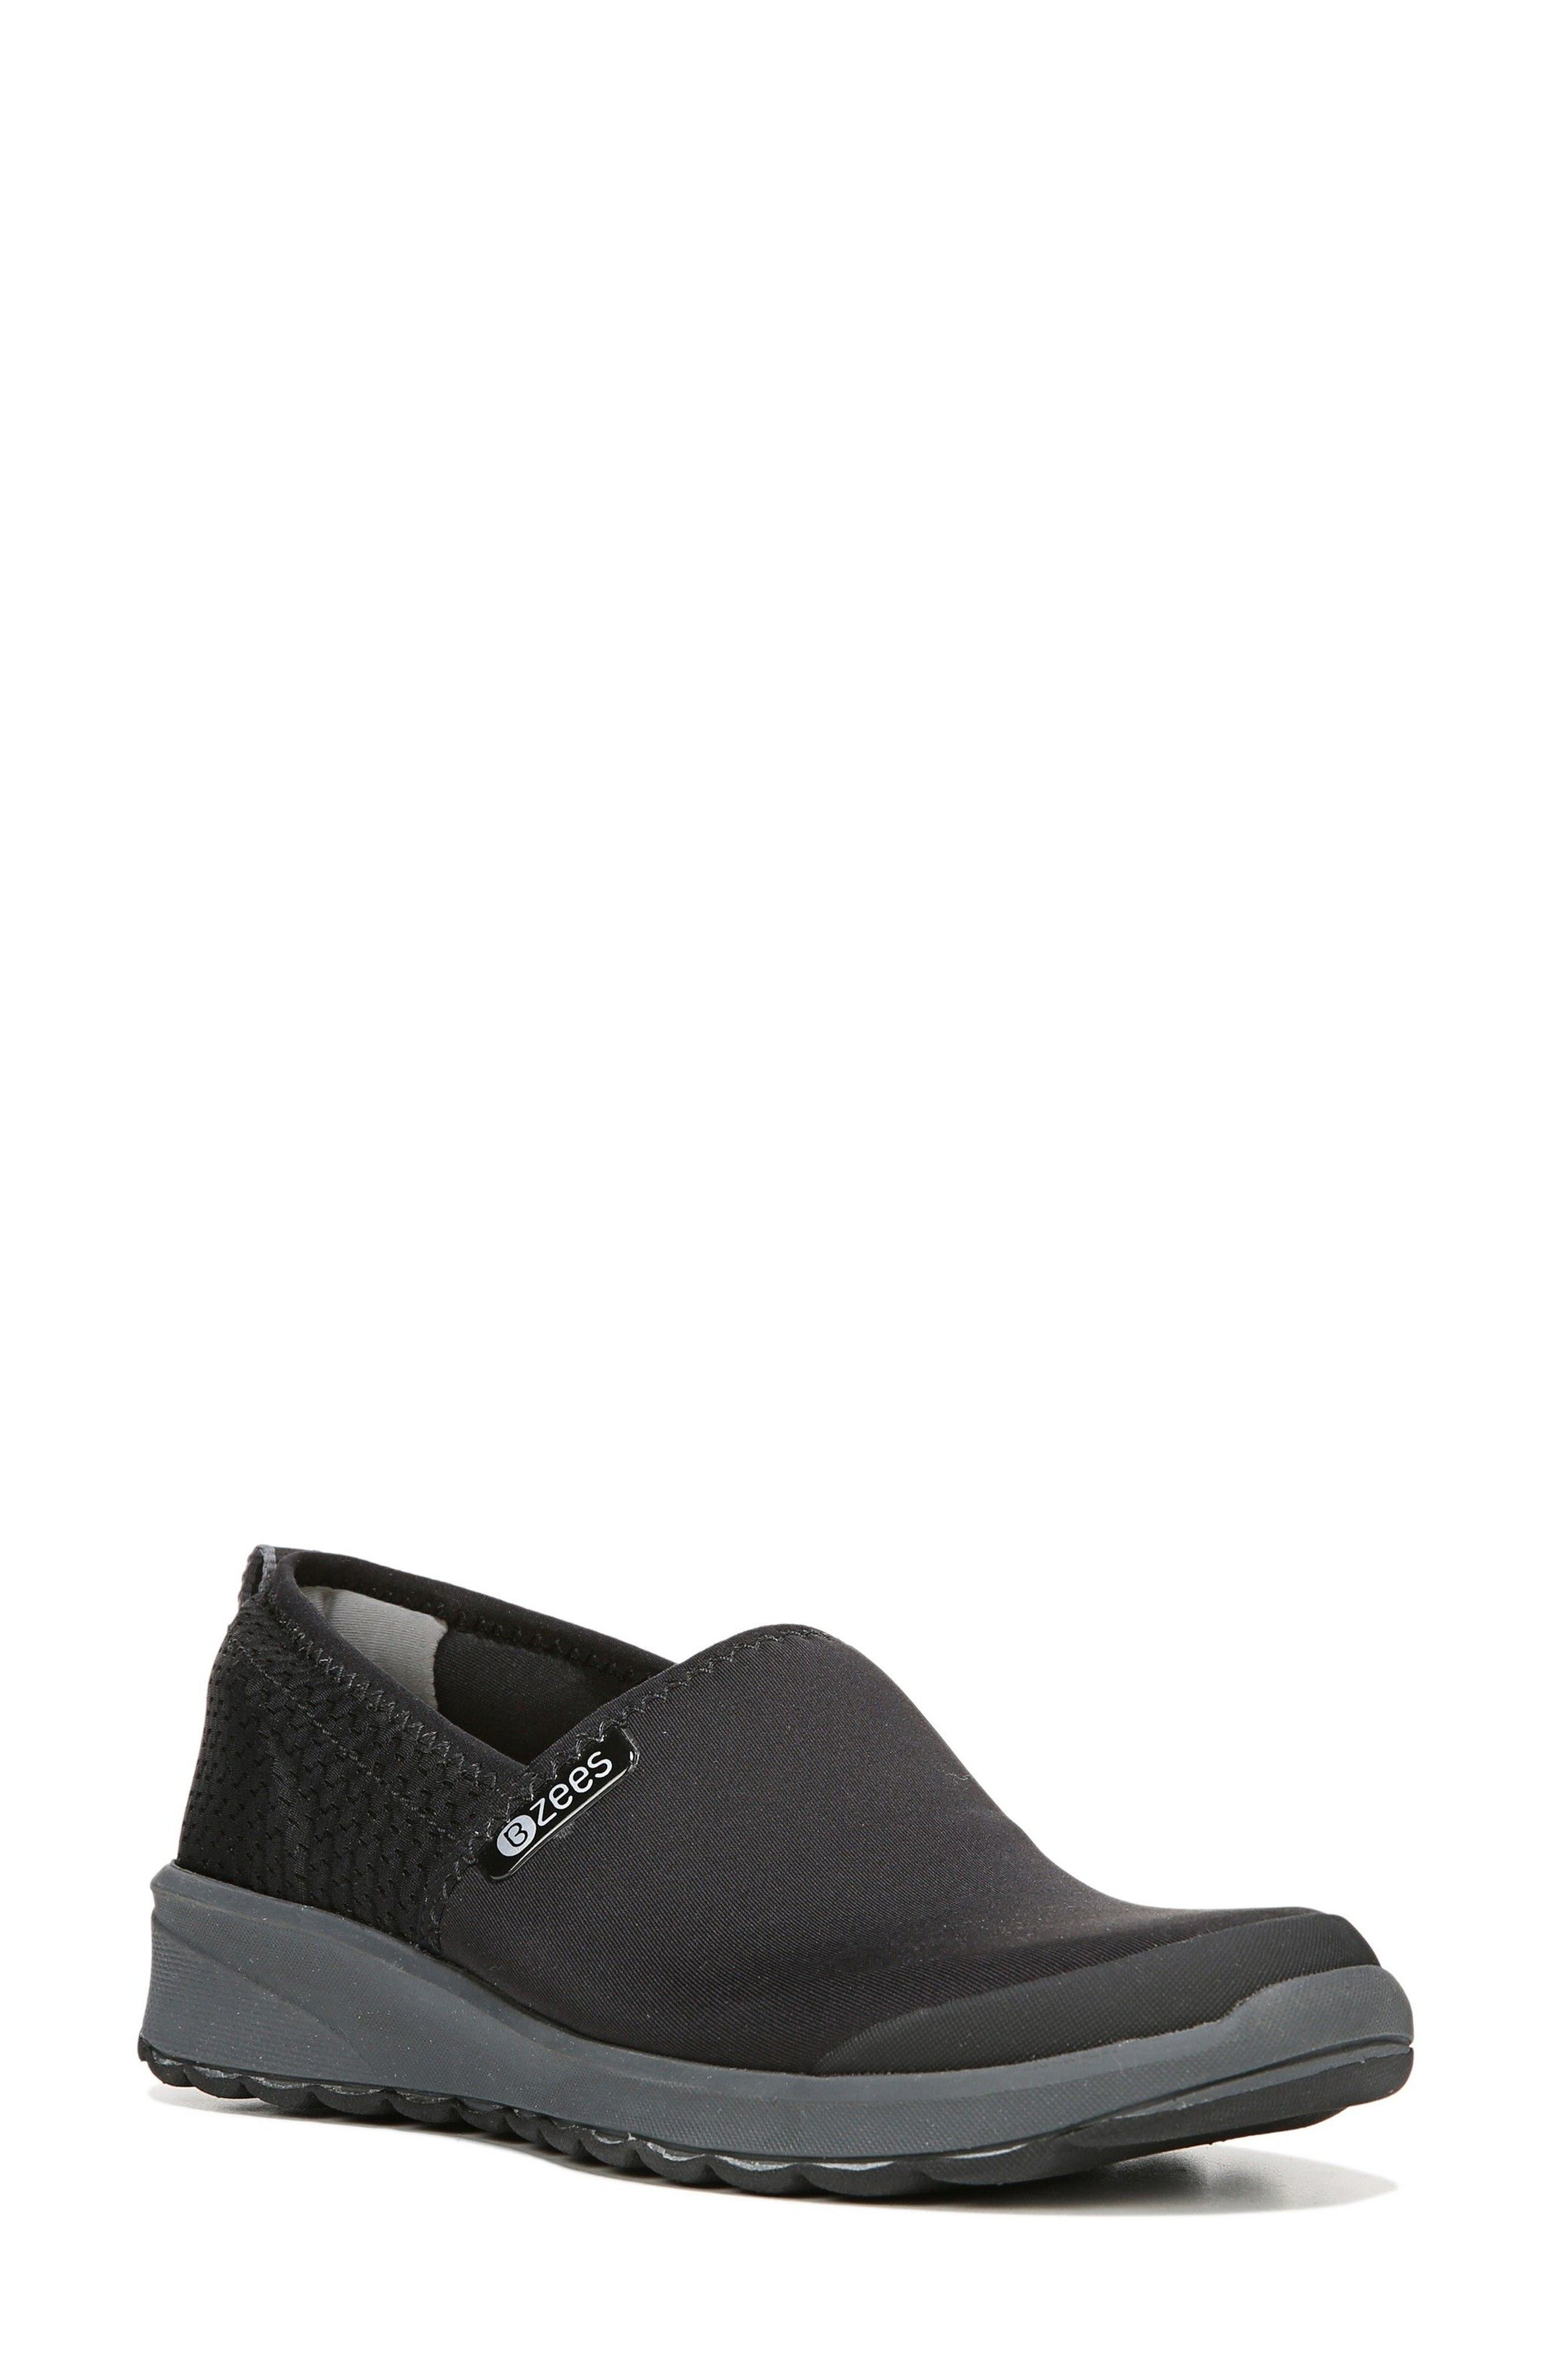 Glee Slip-On Sneaker,                         Main,                         color, Black Fabric